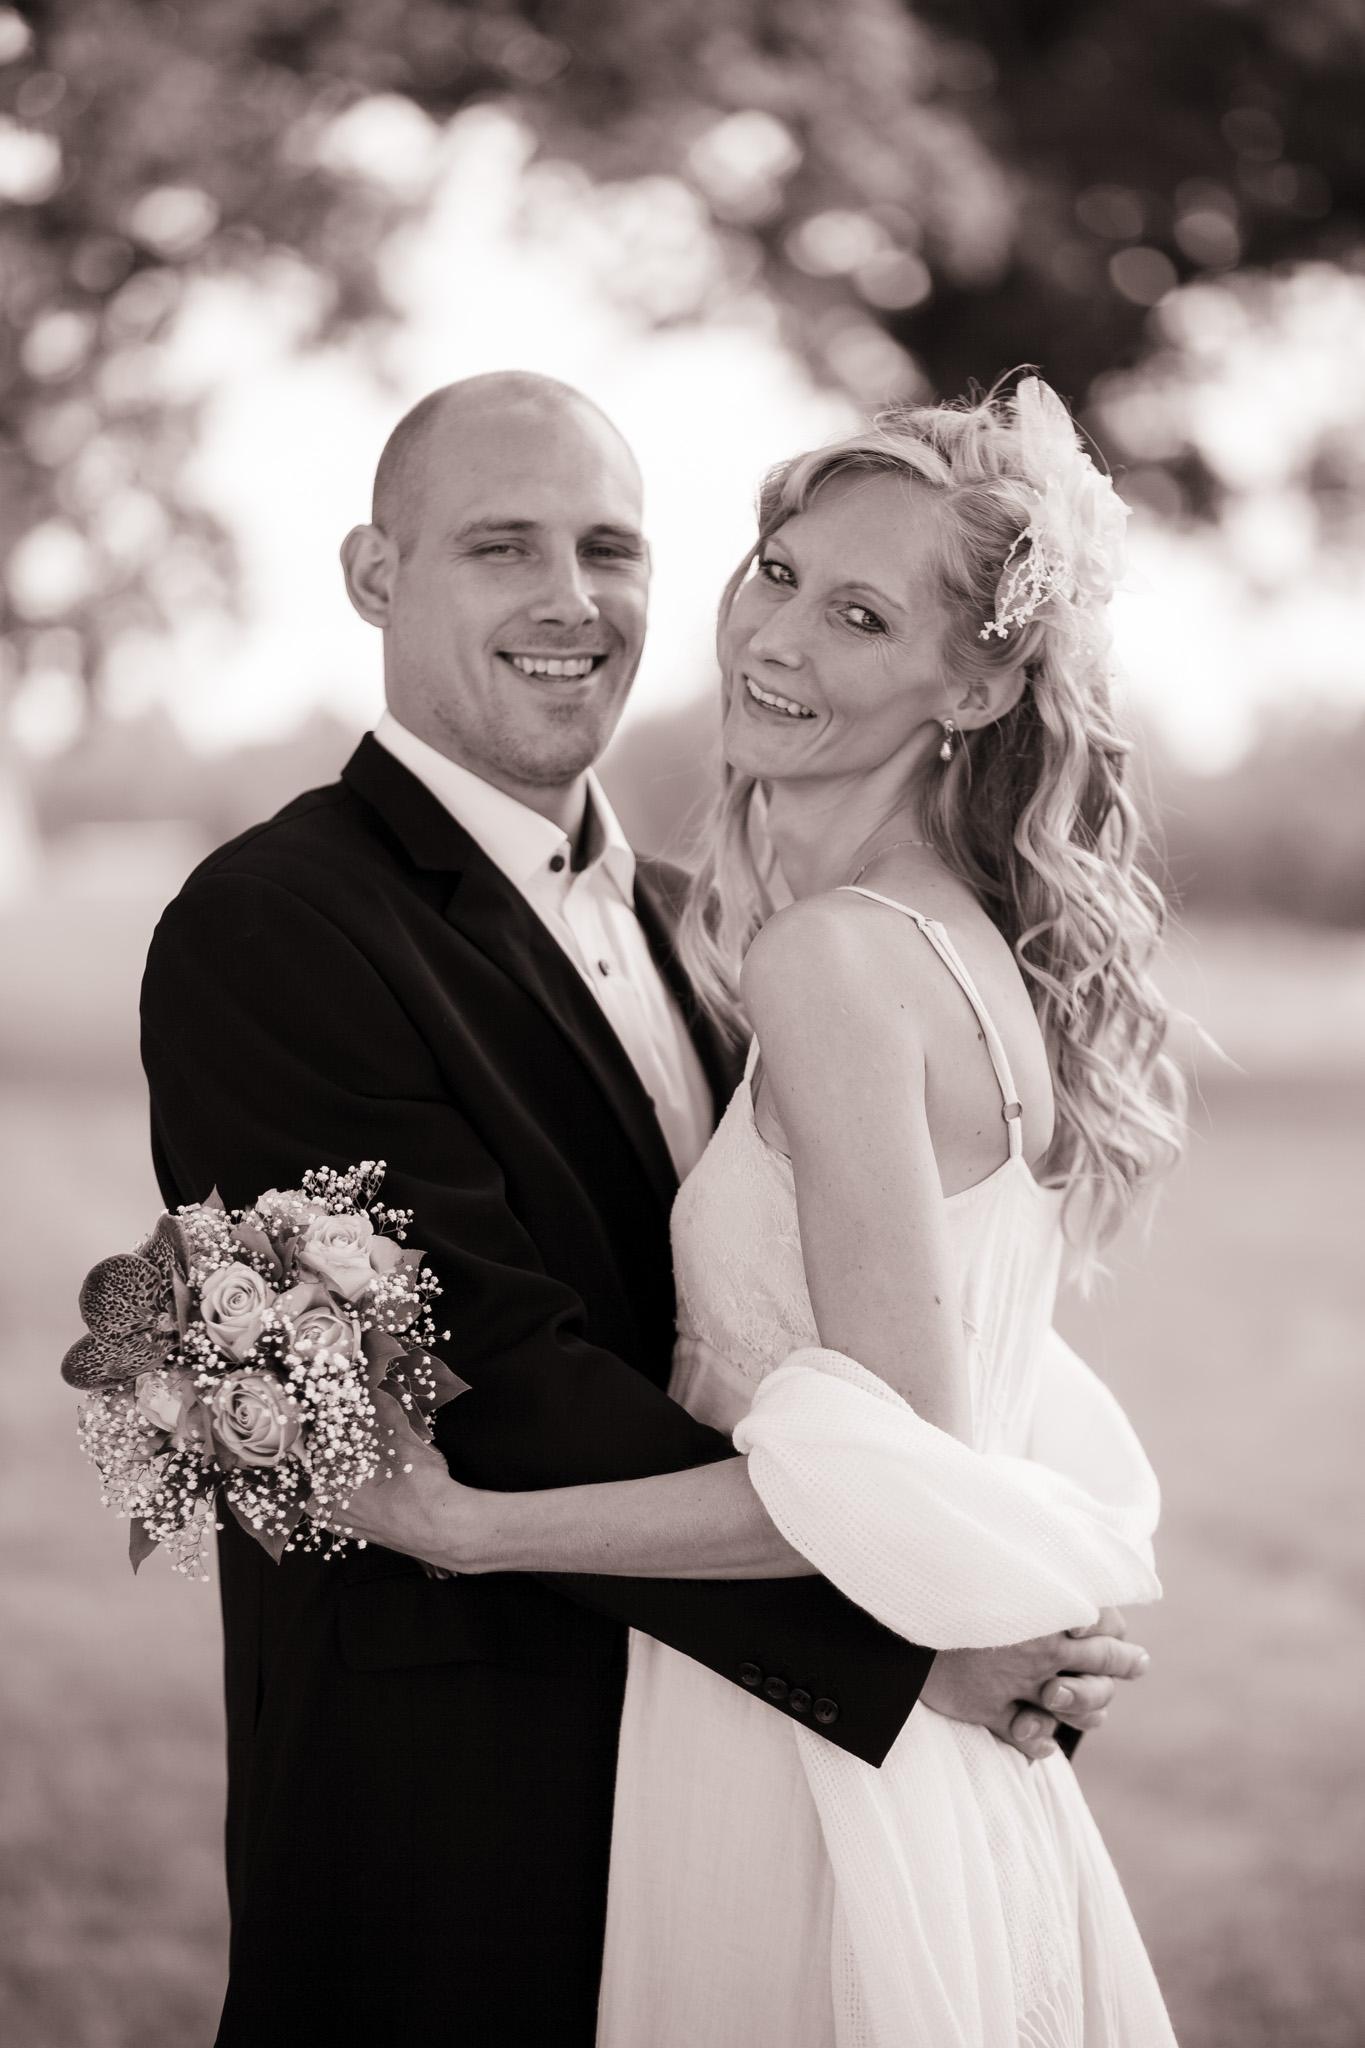 brudepar-vestfold.jpg